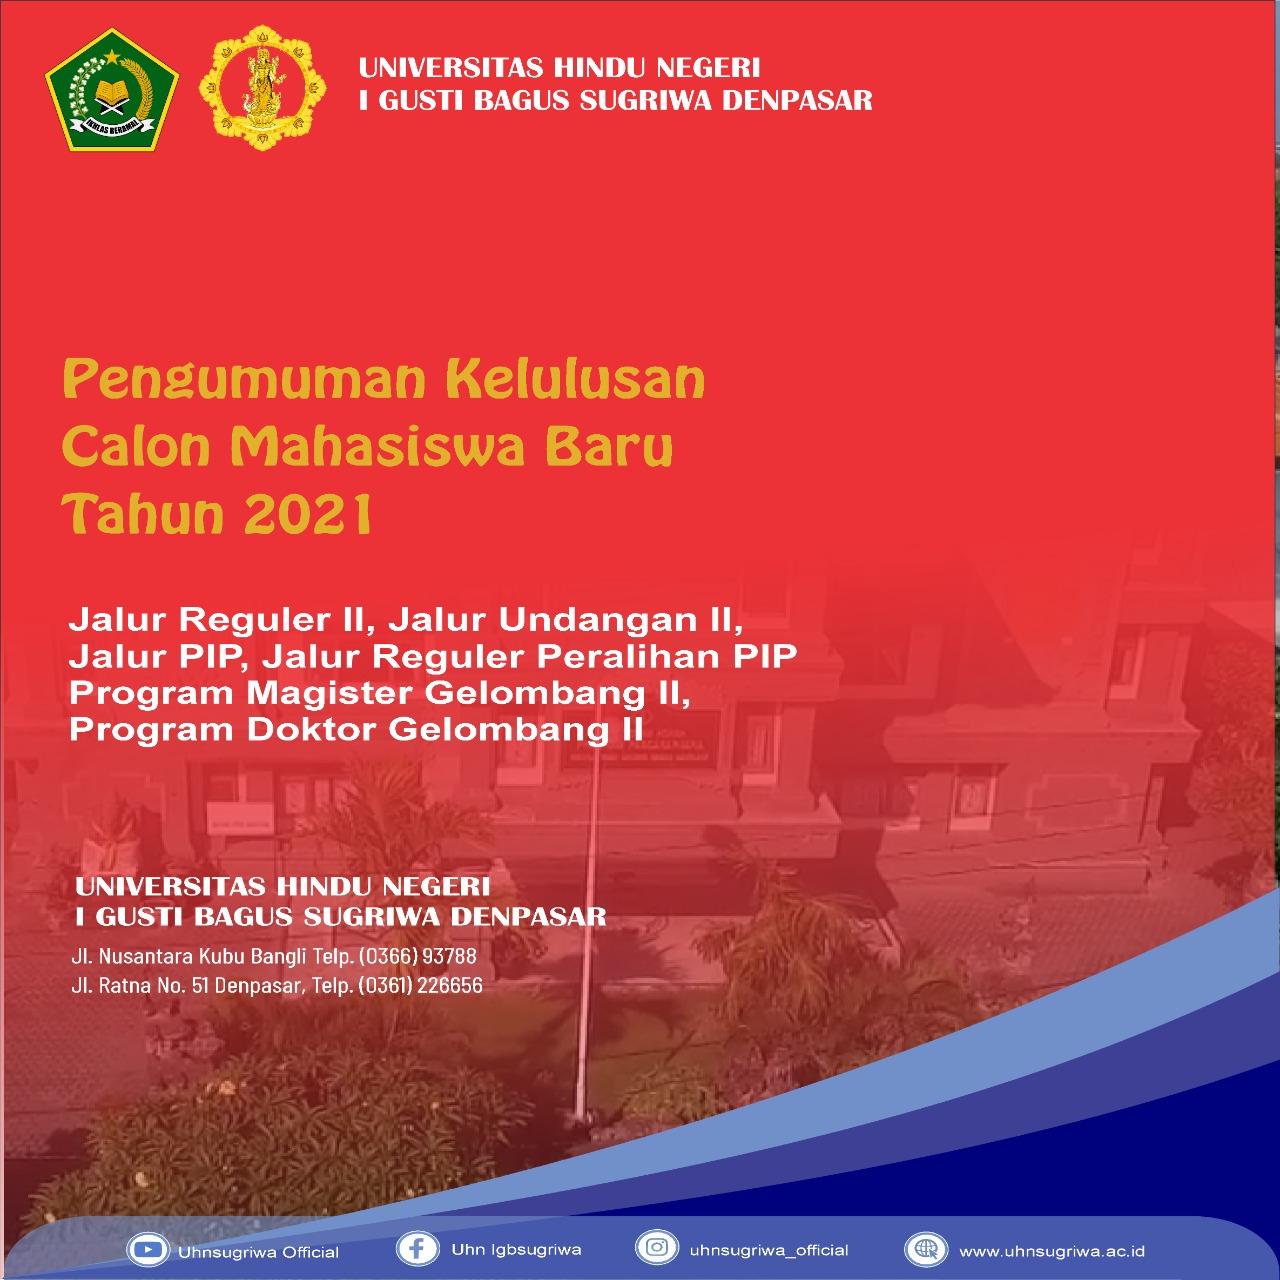 PENGUMUMAN KELULUSAN CALON MAHASISWA BARU GELOMBANG II